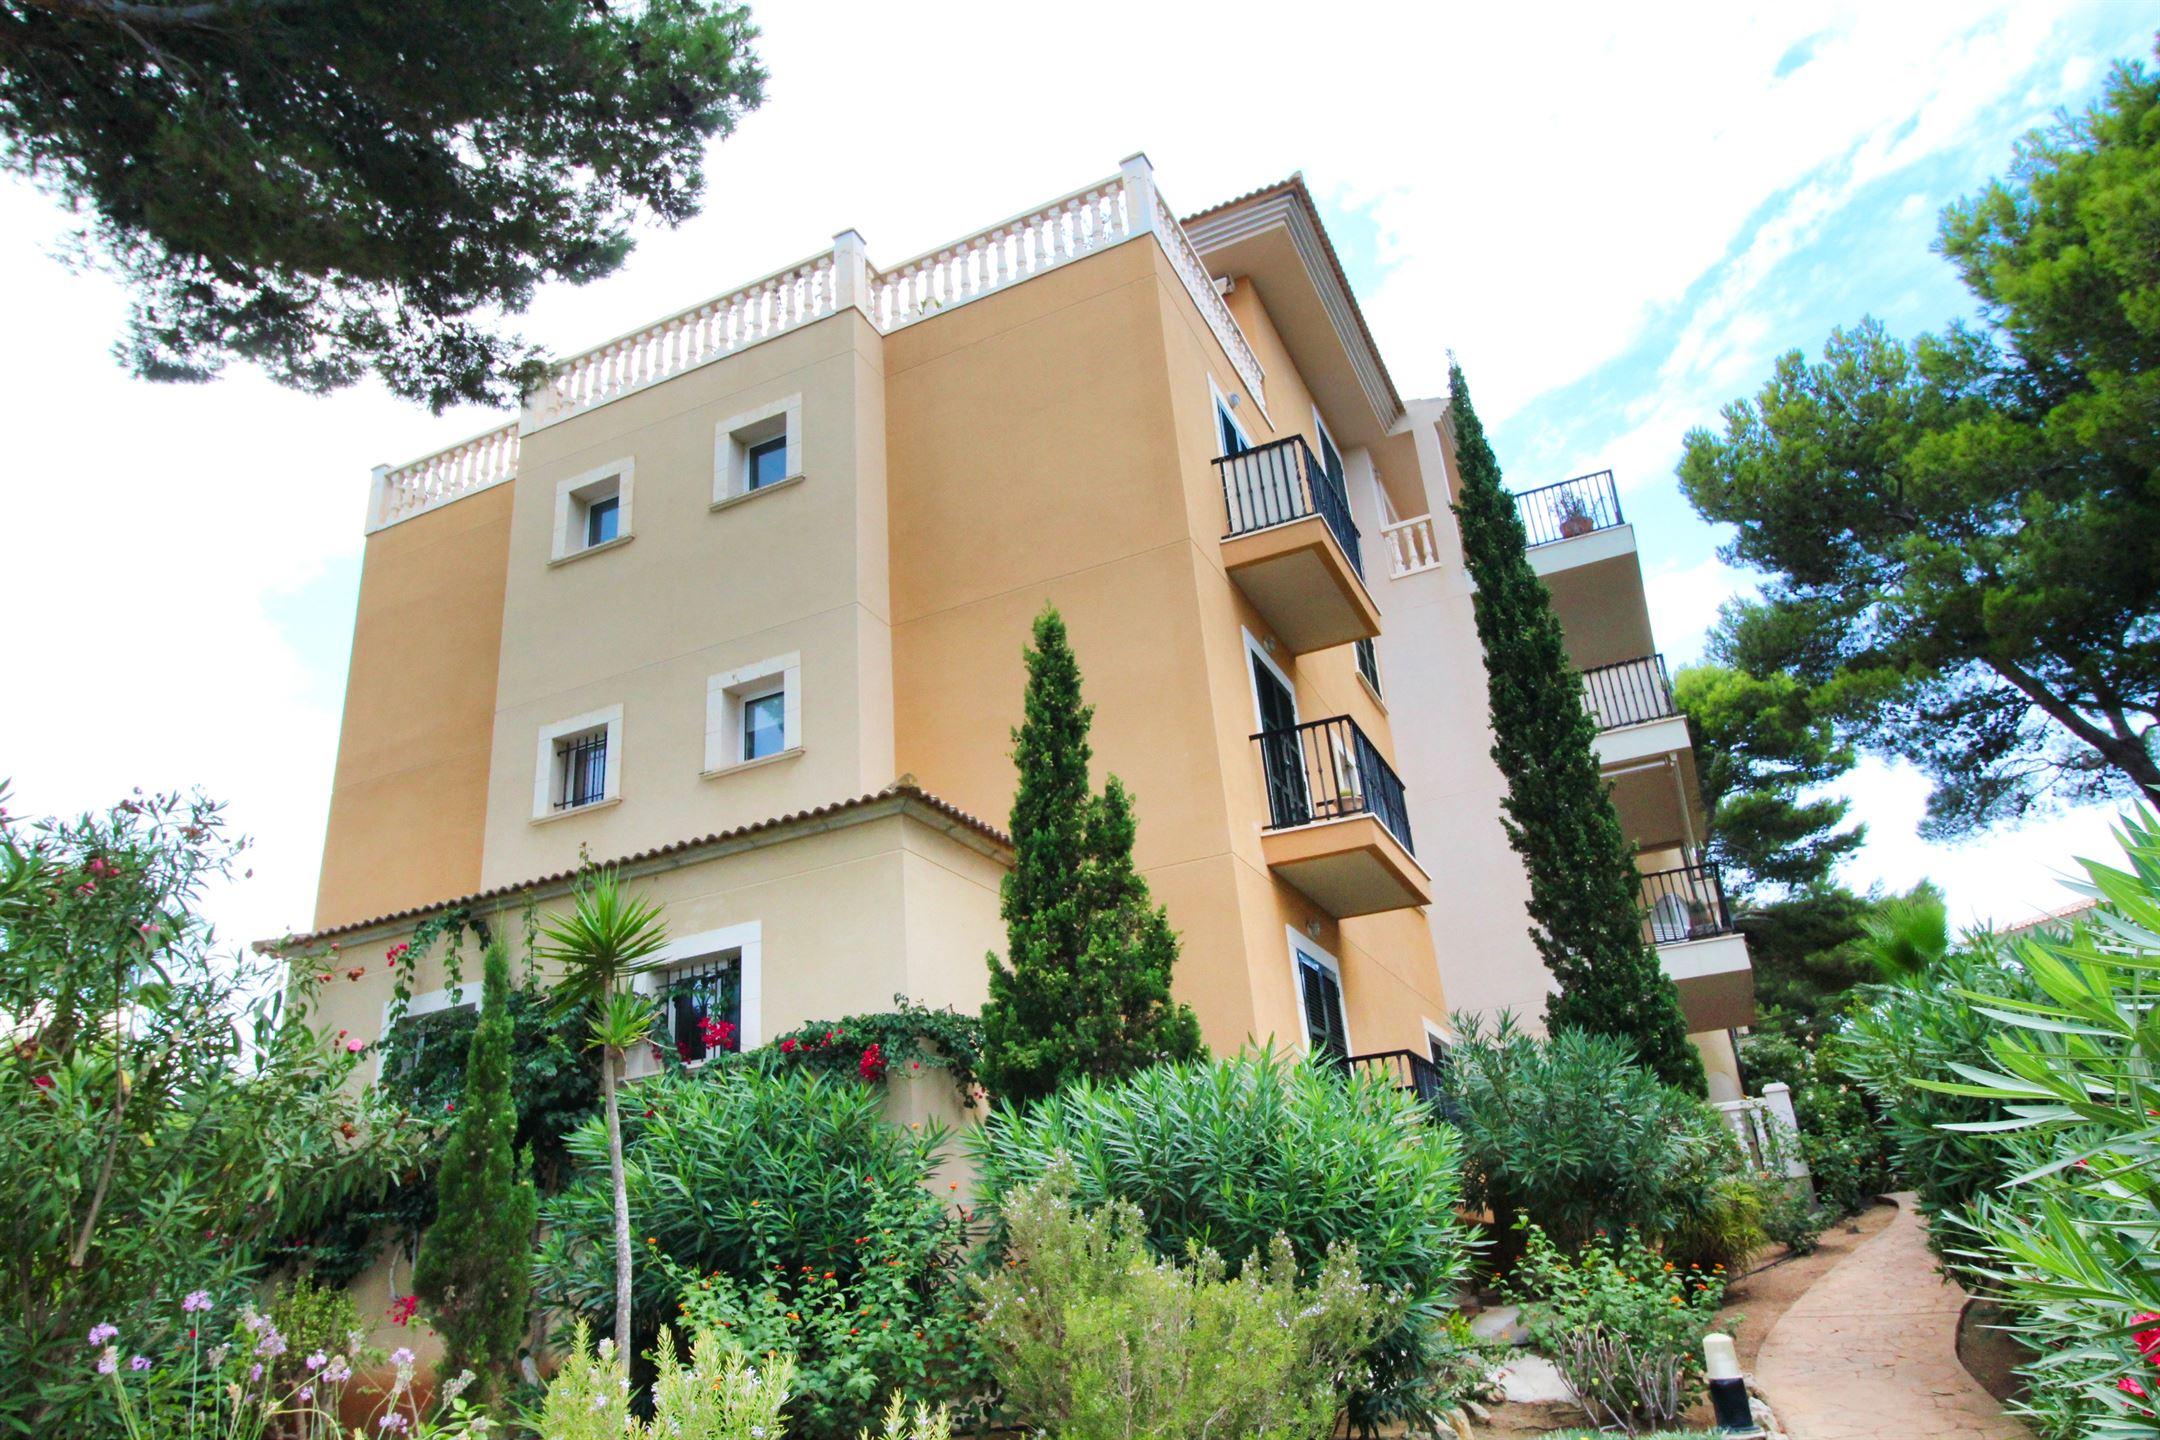 House for sale: Cala Ratjada 07590 Cala Ratjada Spain [funda]